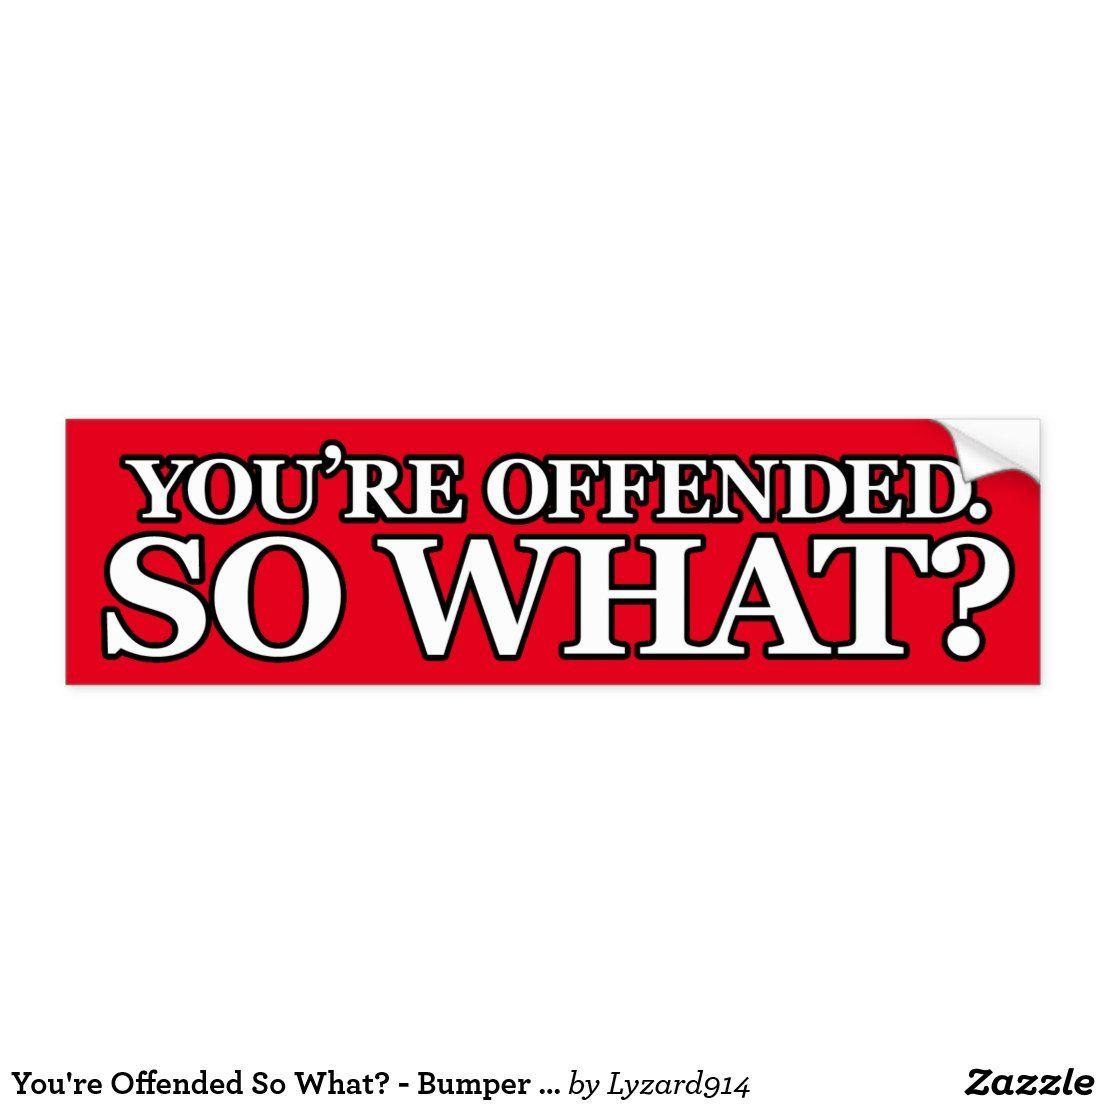 Not Yours Pro Choice Bumper Sticker Zazzle Com Bumper Stickers Pro Choice Strong Adhesive [ 1106 x 1106 Pixel ]